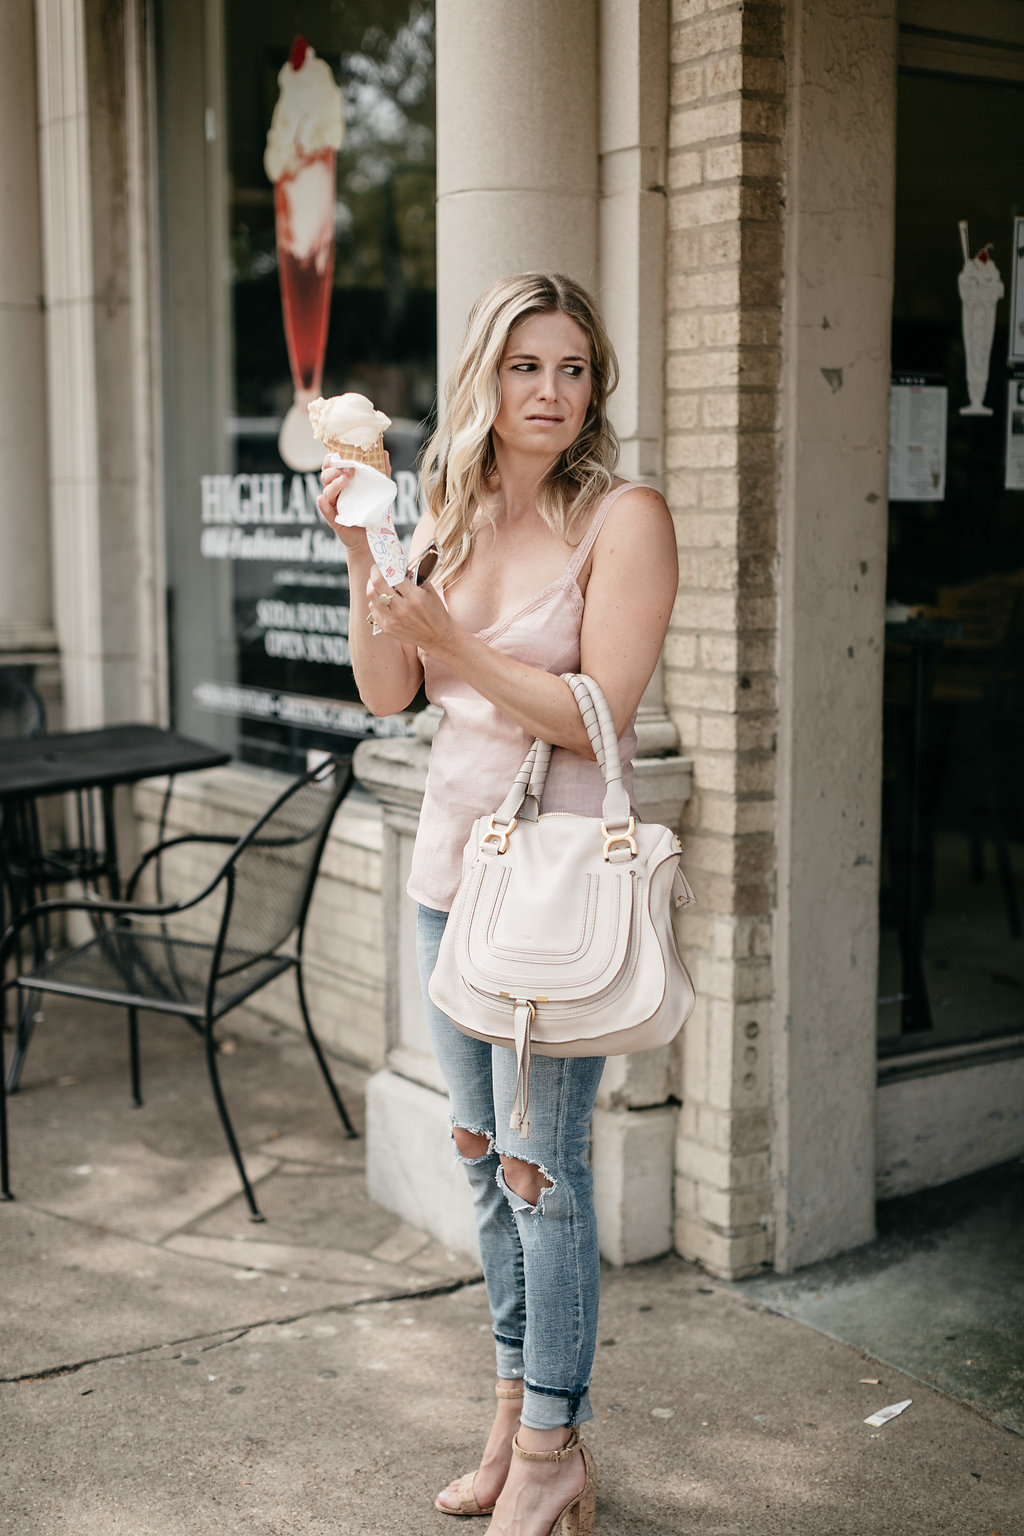 Blooper Photos From Dallas Blogger